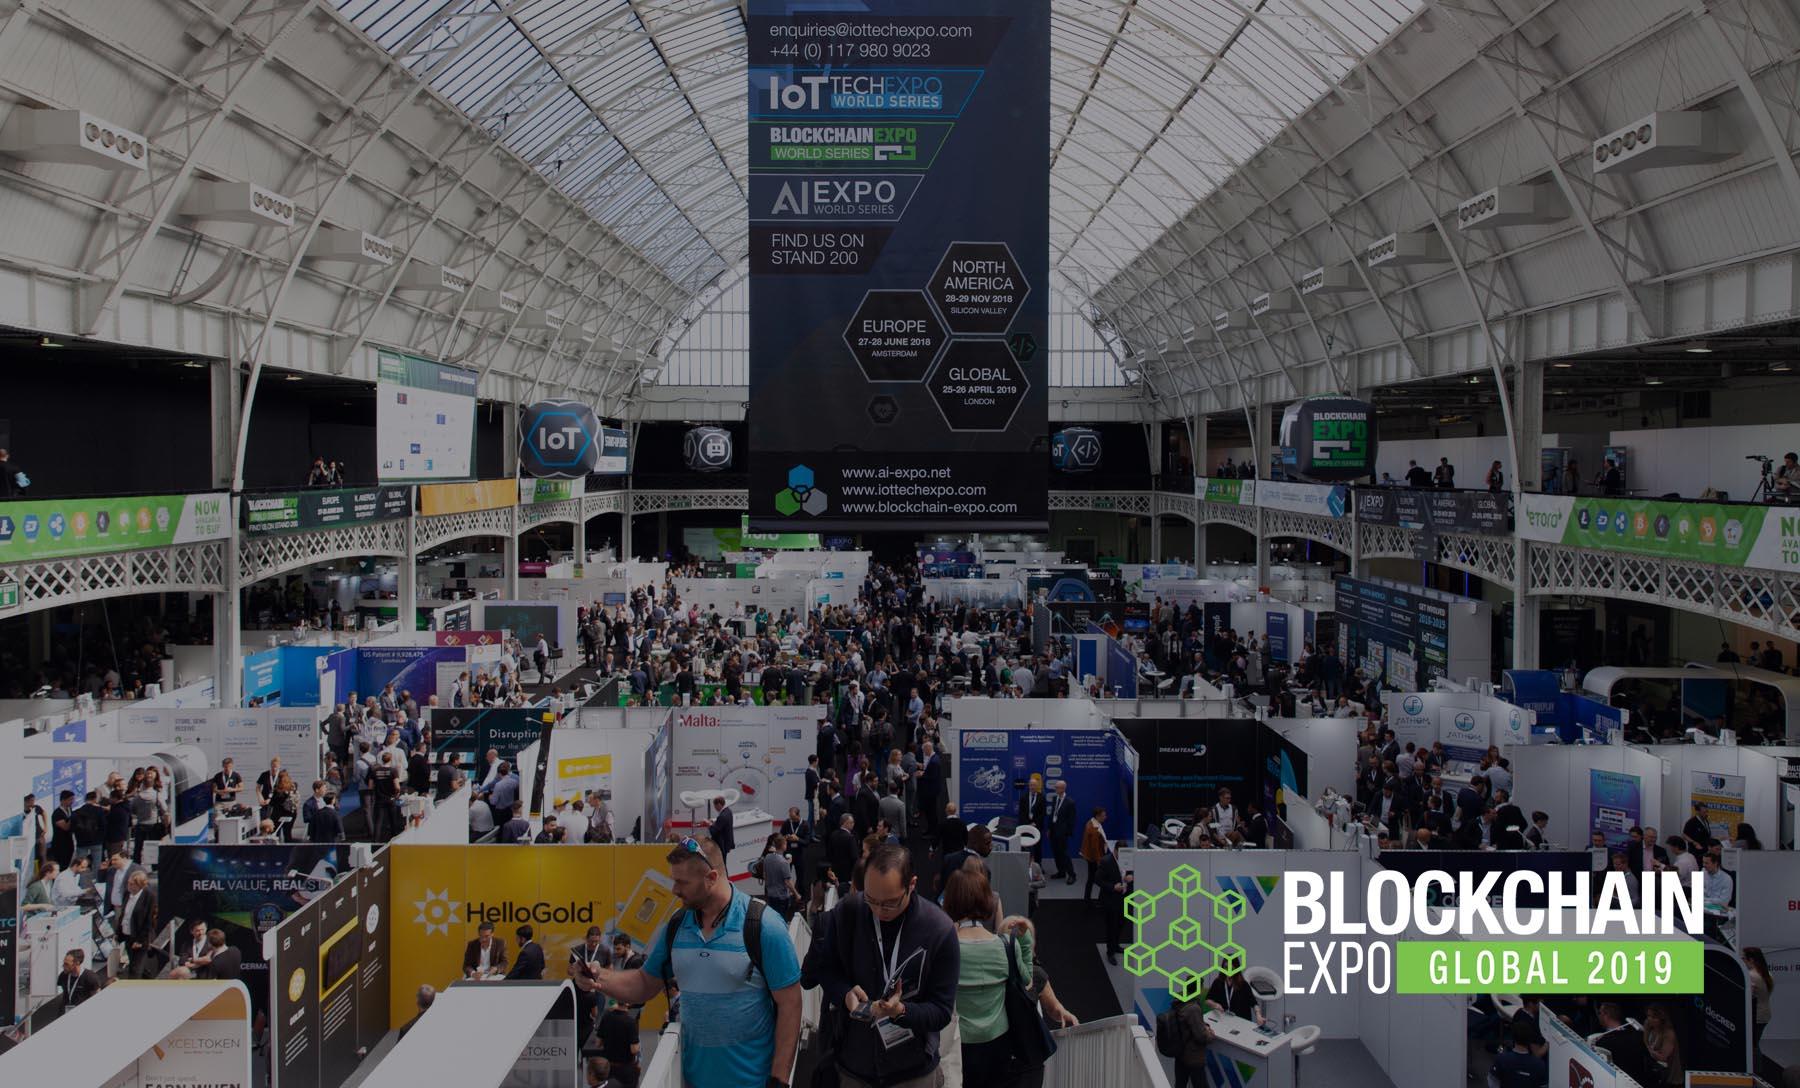 London's Blockchain Conference; Blockchain Expo Global Exhibition announces expert speakers